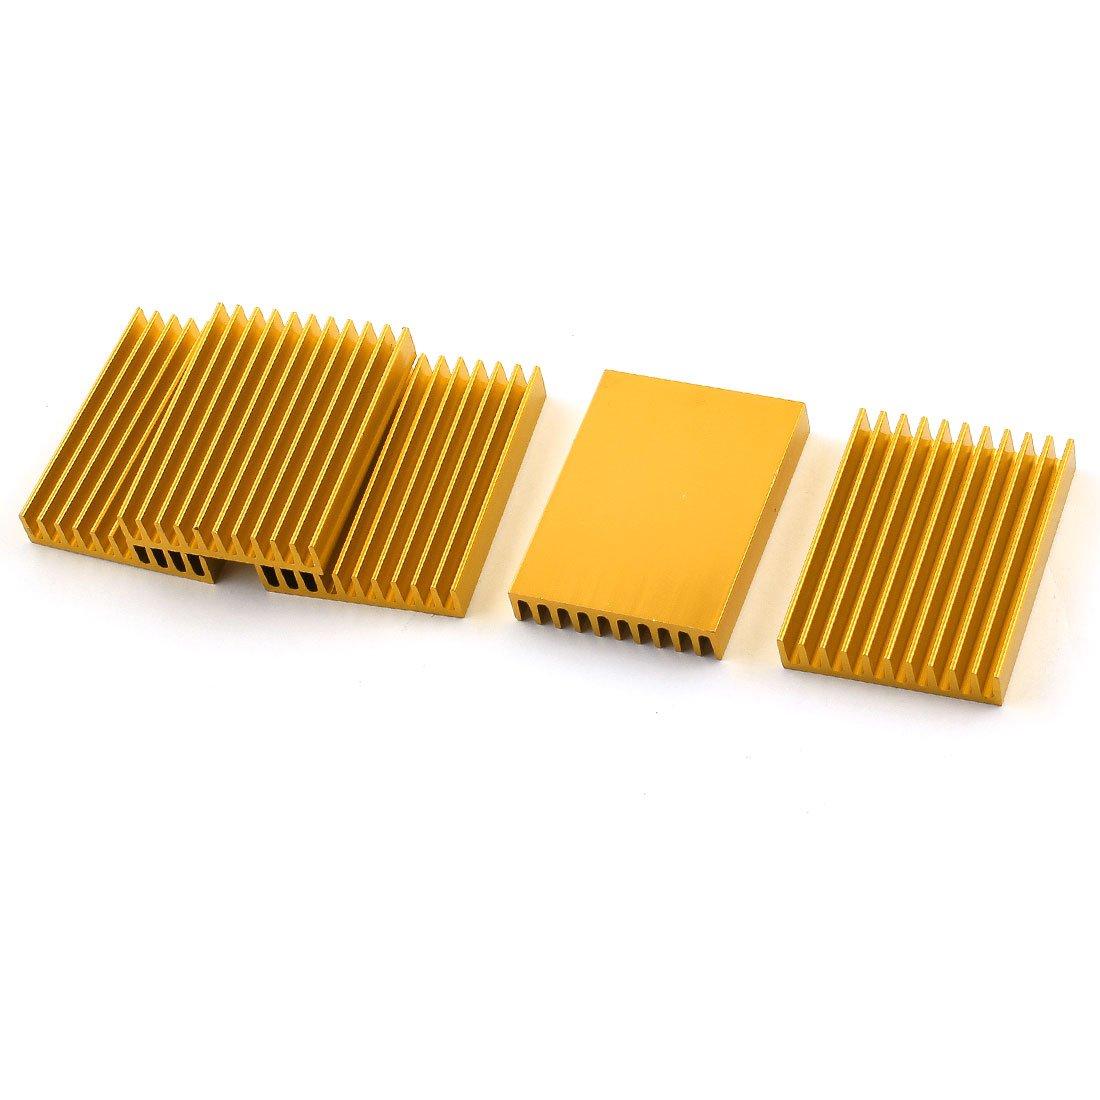 5Pcs 45x10x60mm Aluminium Heatsink Heat Diffuse Cooling Cooler Fin